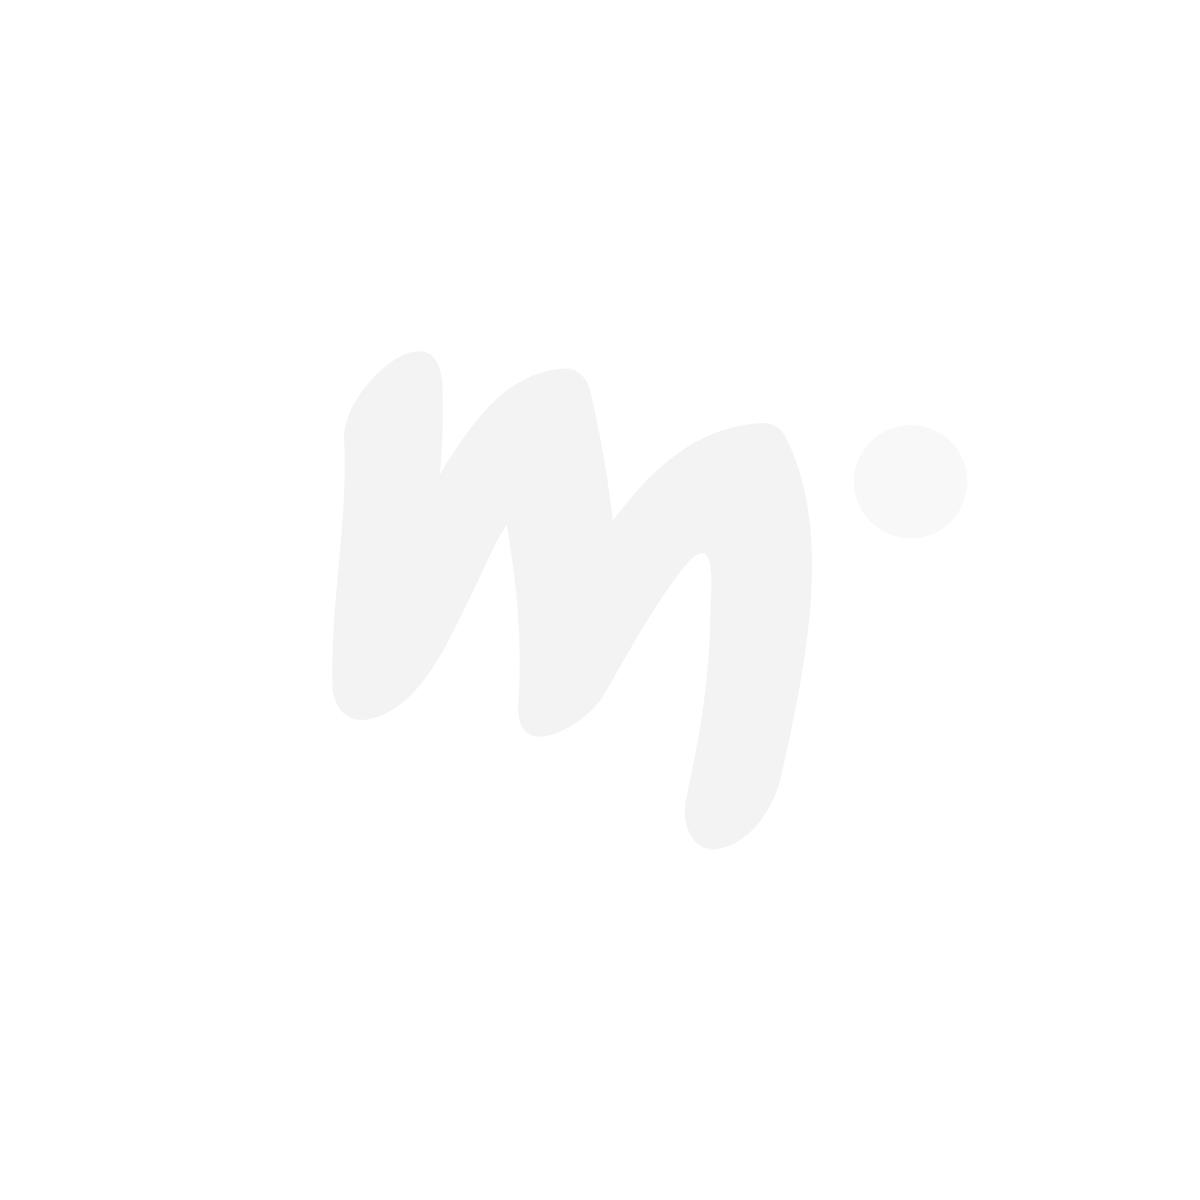 Lena Furberg Bandit in a Close-up Tin Box, Set of 3